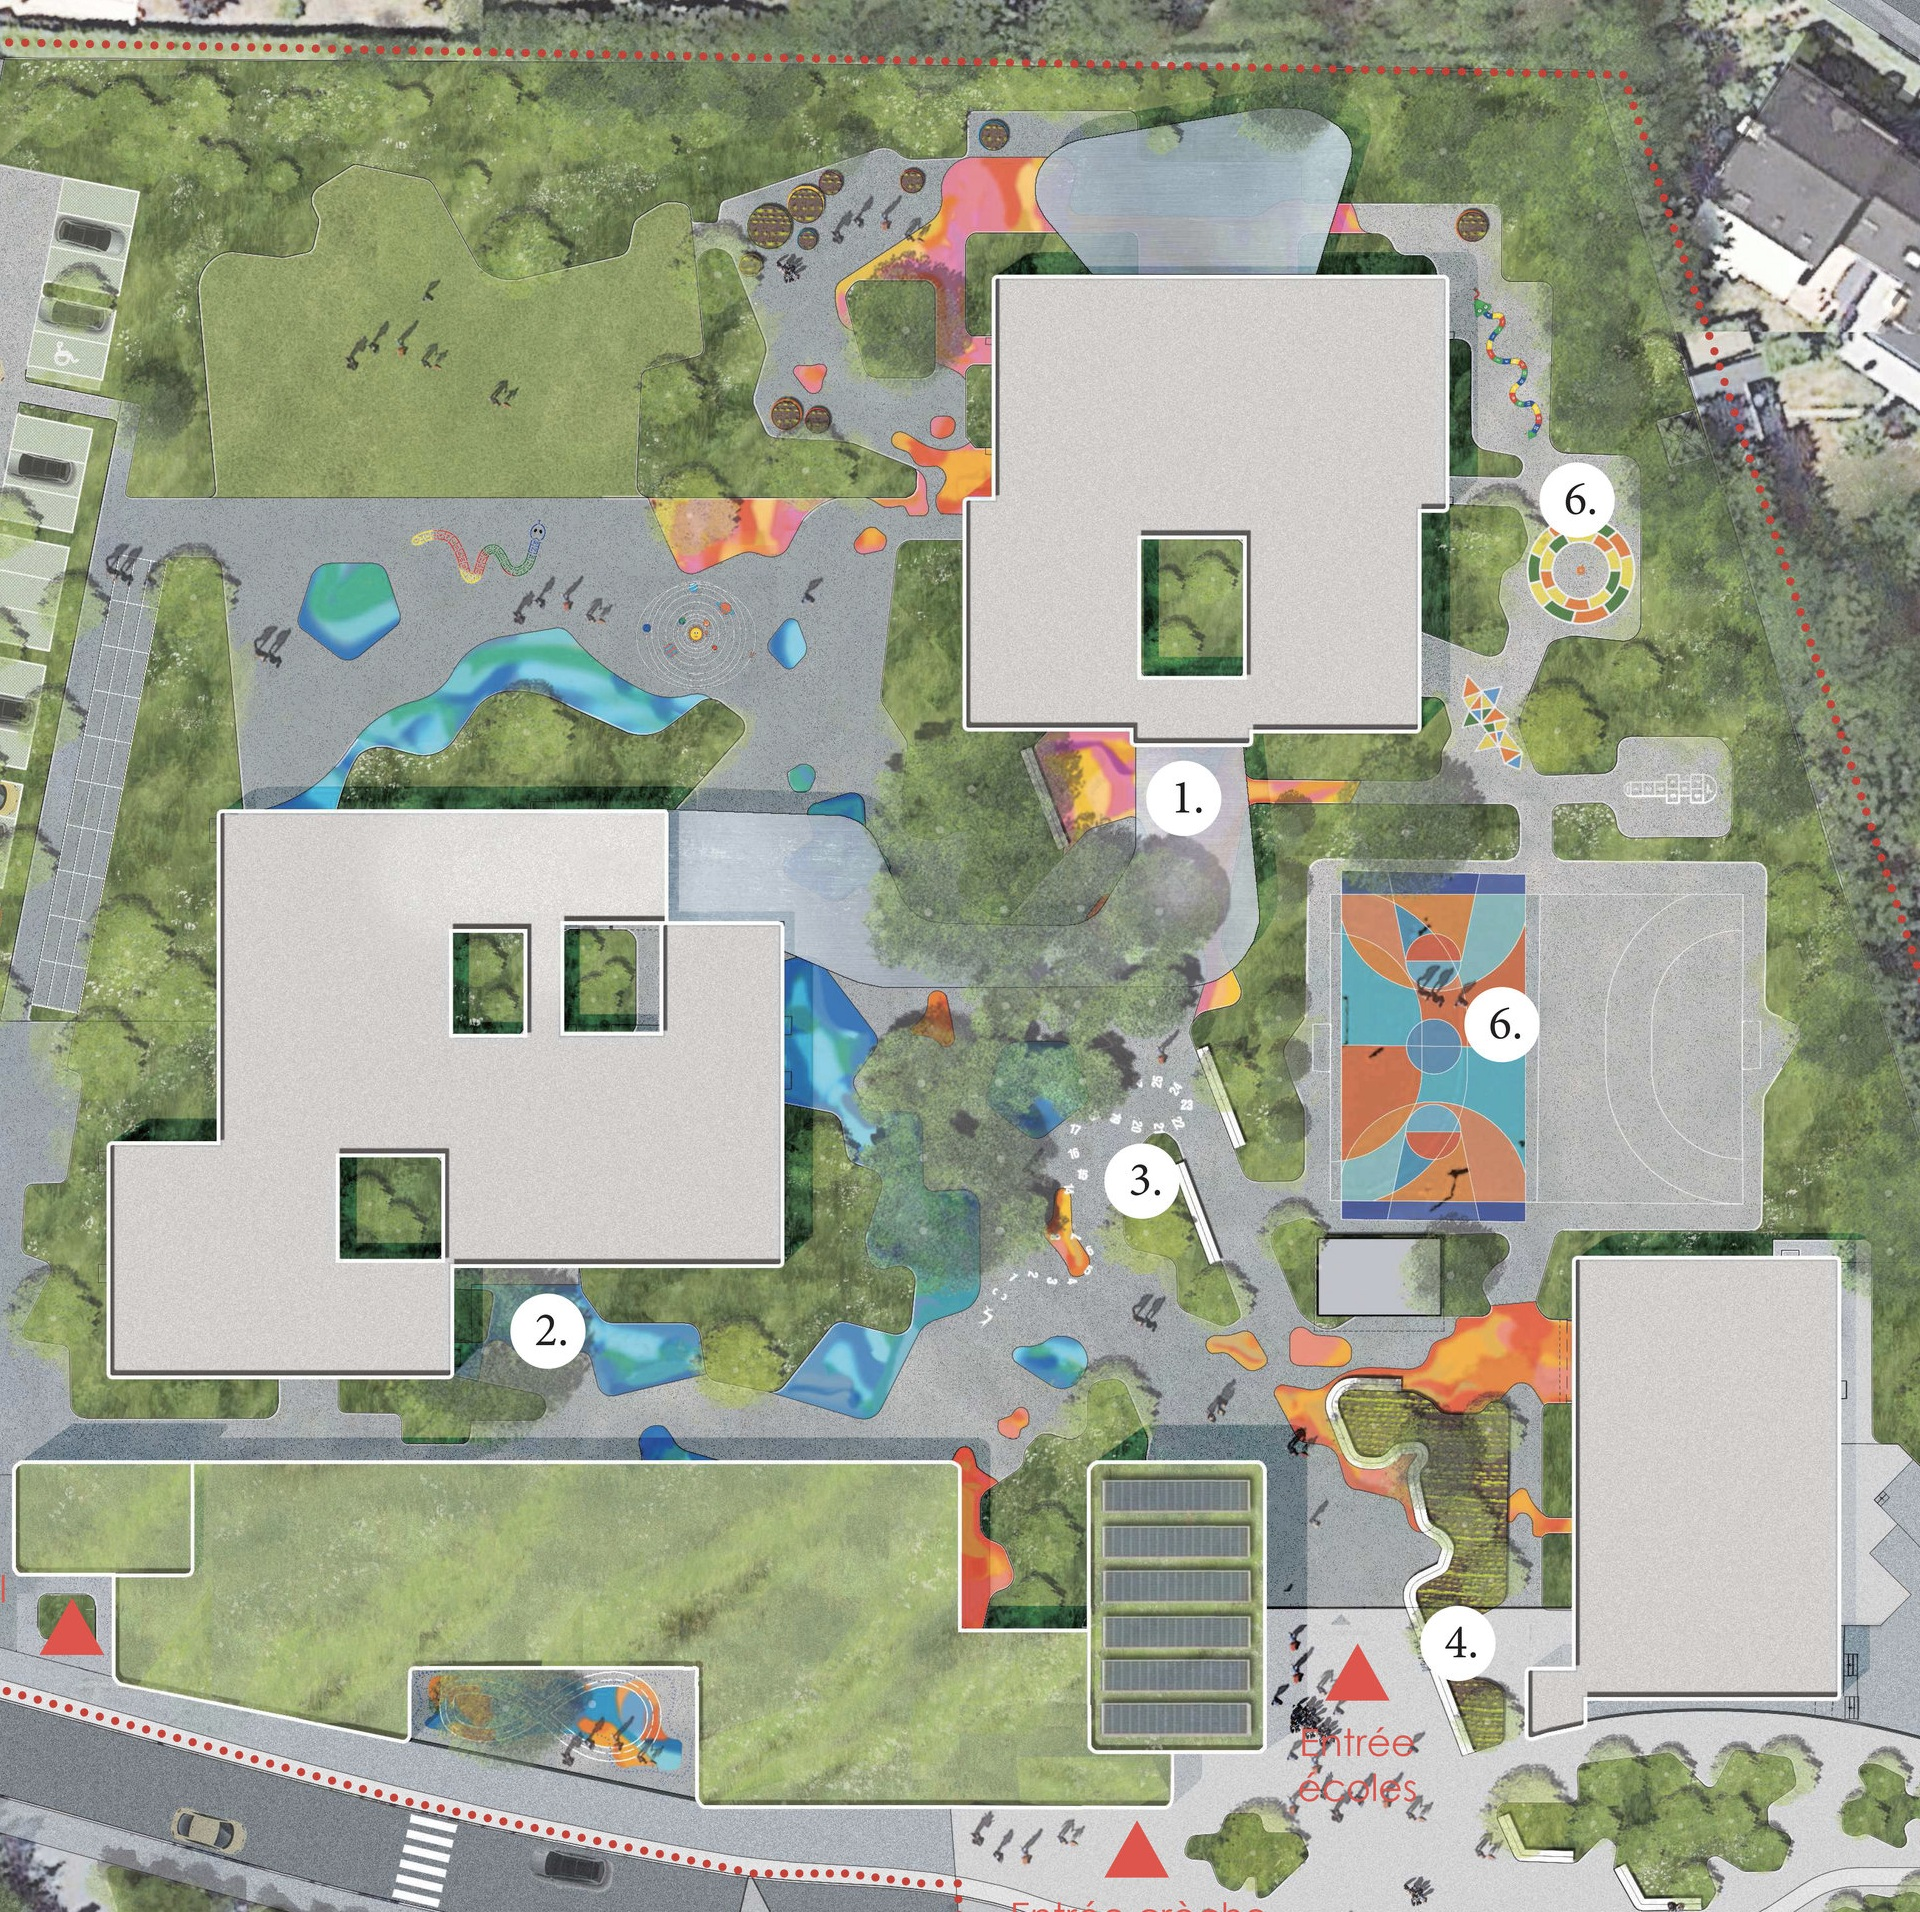 school_saint_nazaire_public_outdoor_design_christophe_gautrand_landscape_2.jpg